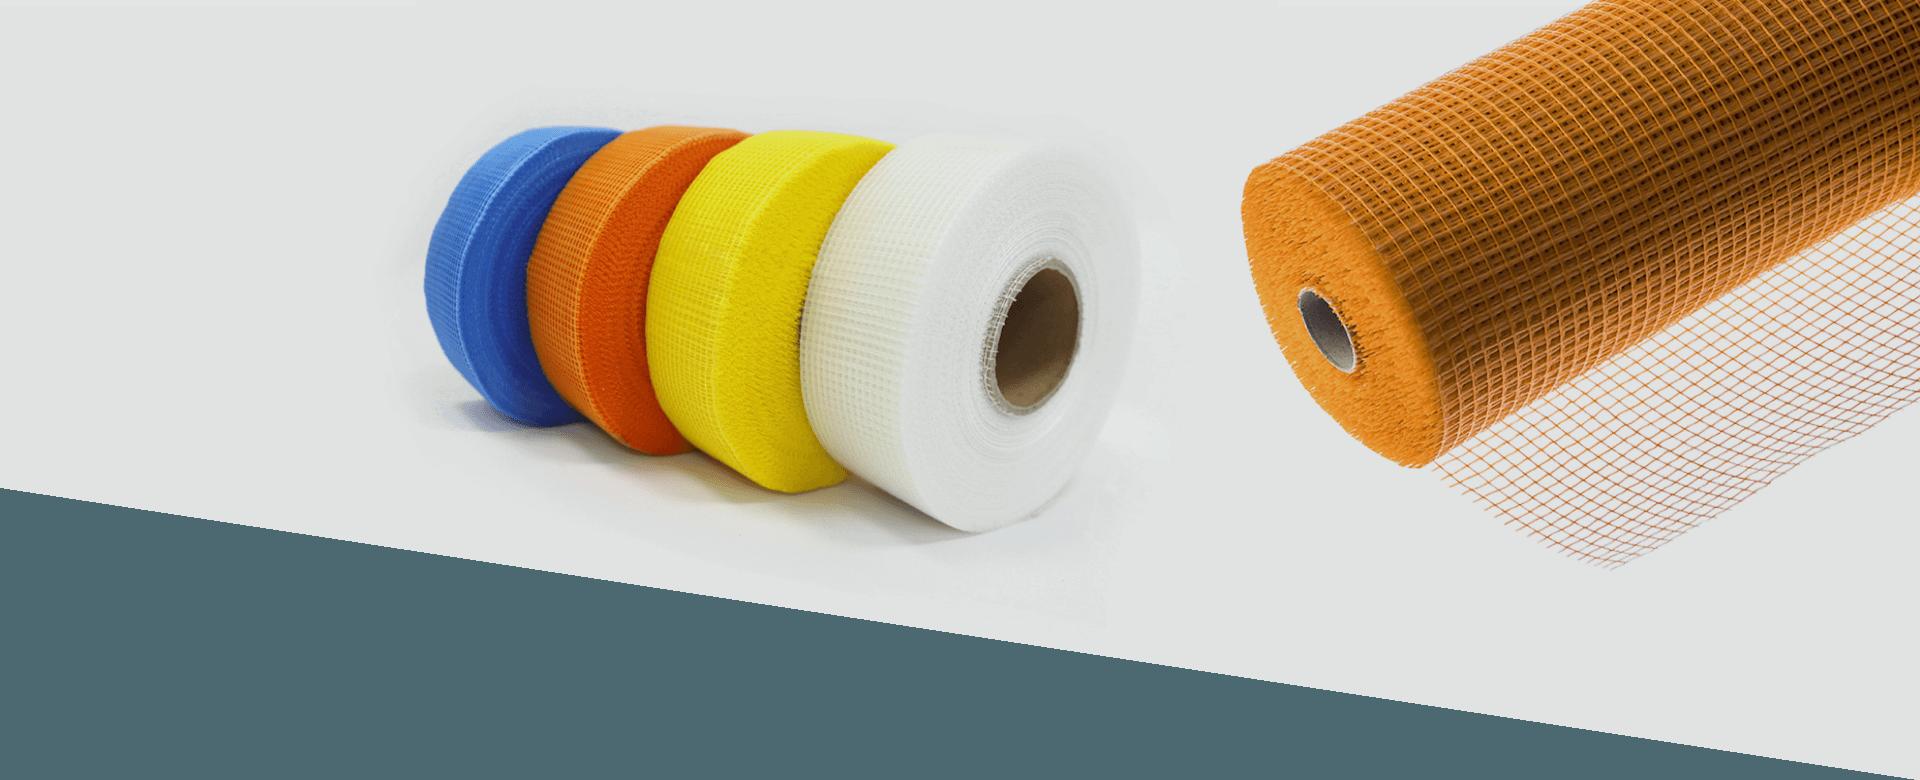 Fiberglass Products Manufacturer & Supplier